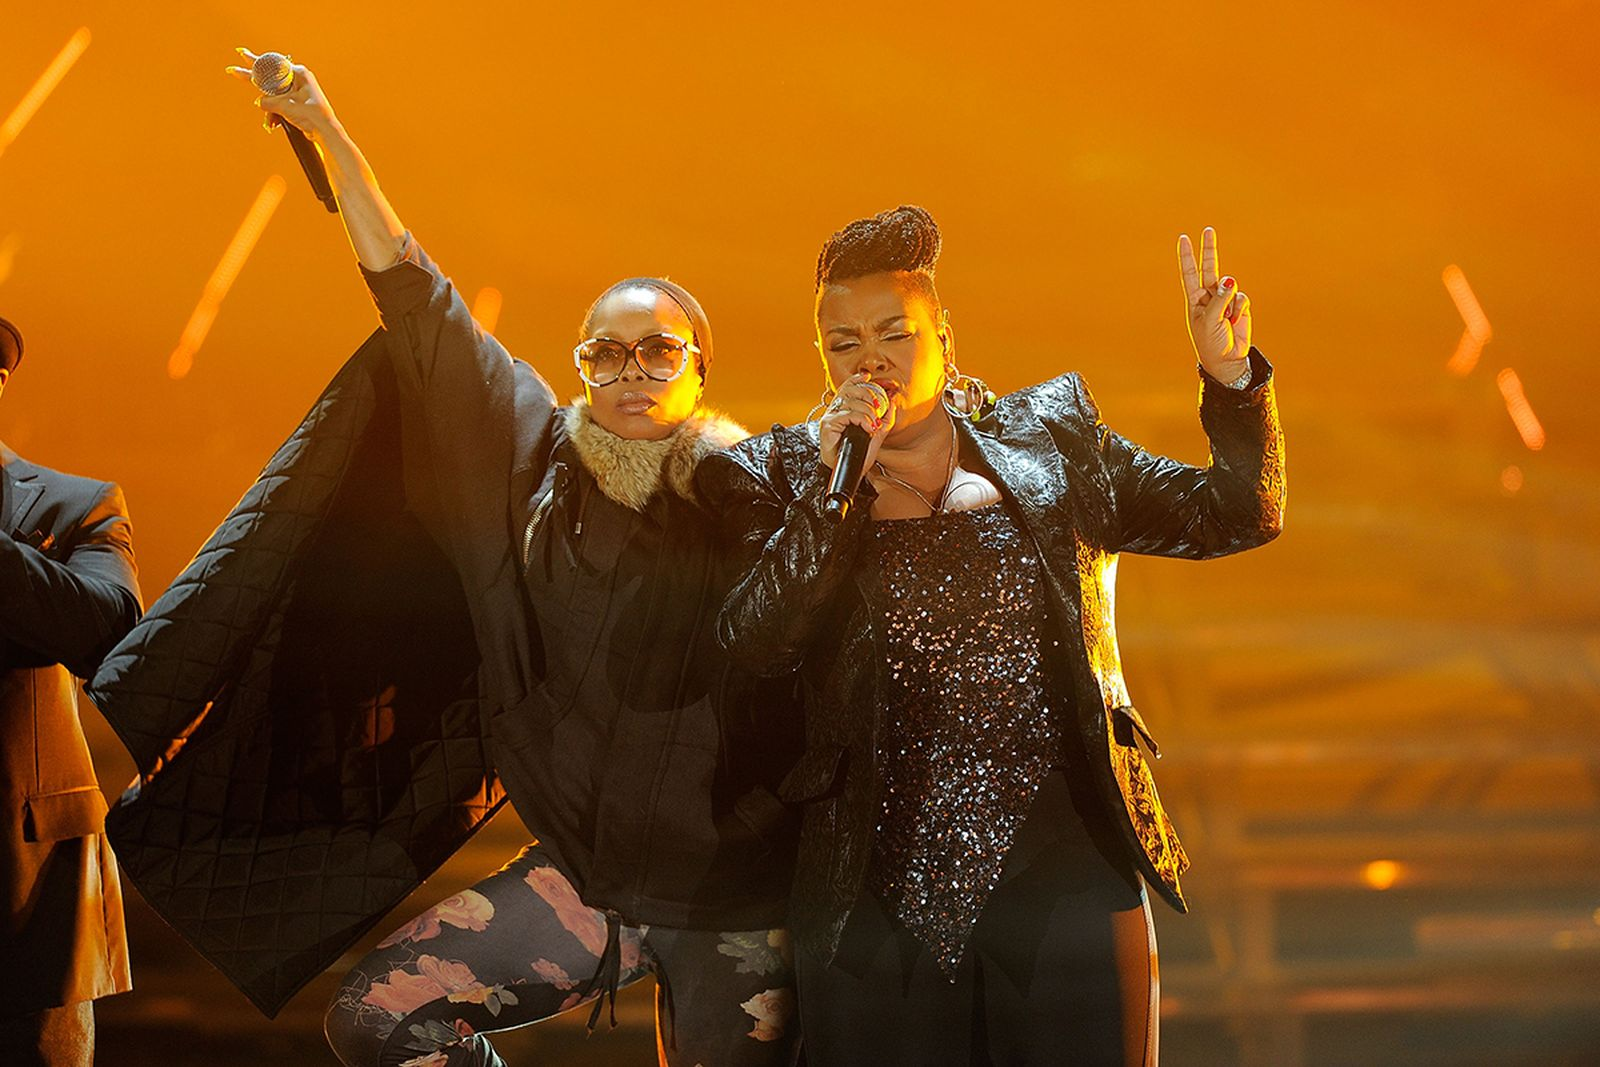 Erykah Badu and Jill Scott performing